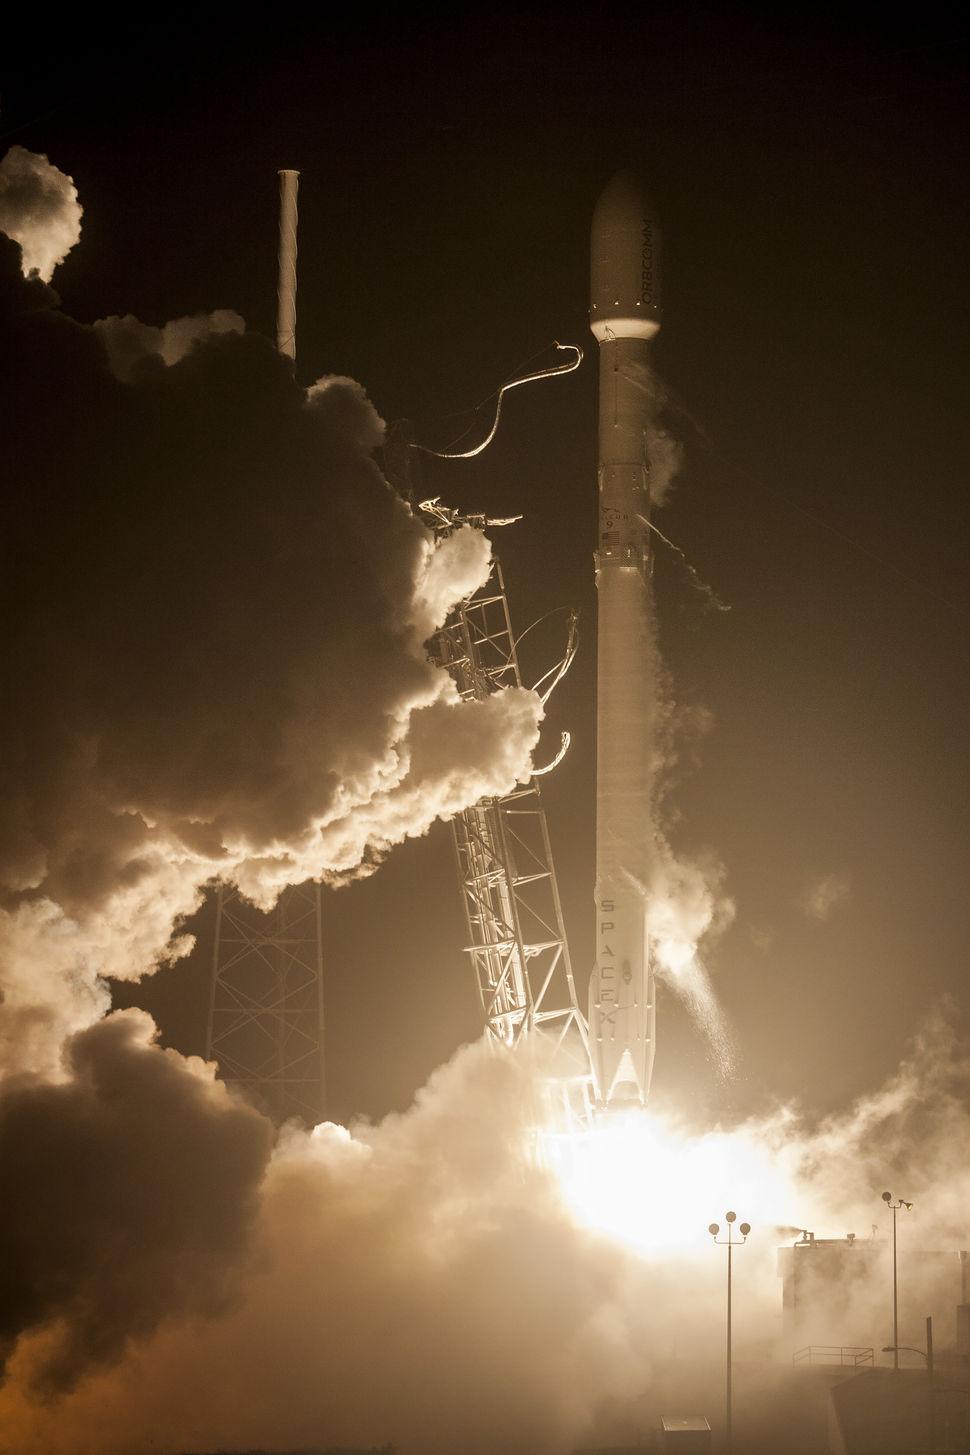 إطلاق صاروخي لشركة SpaceX